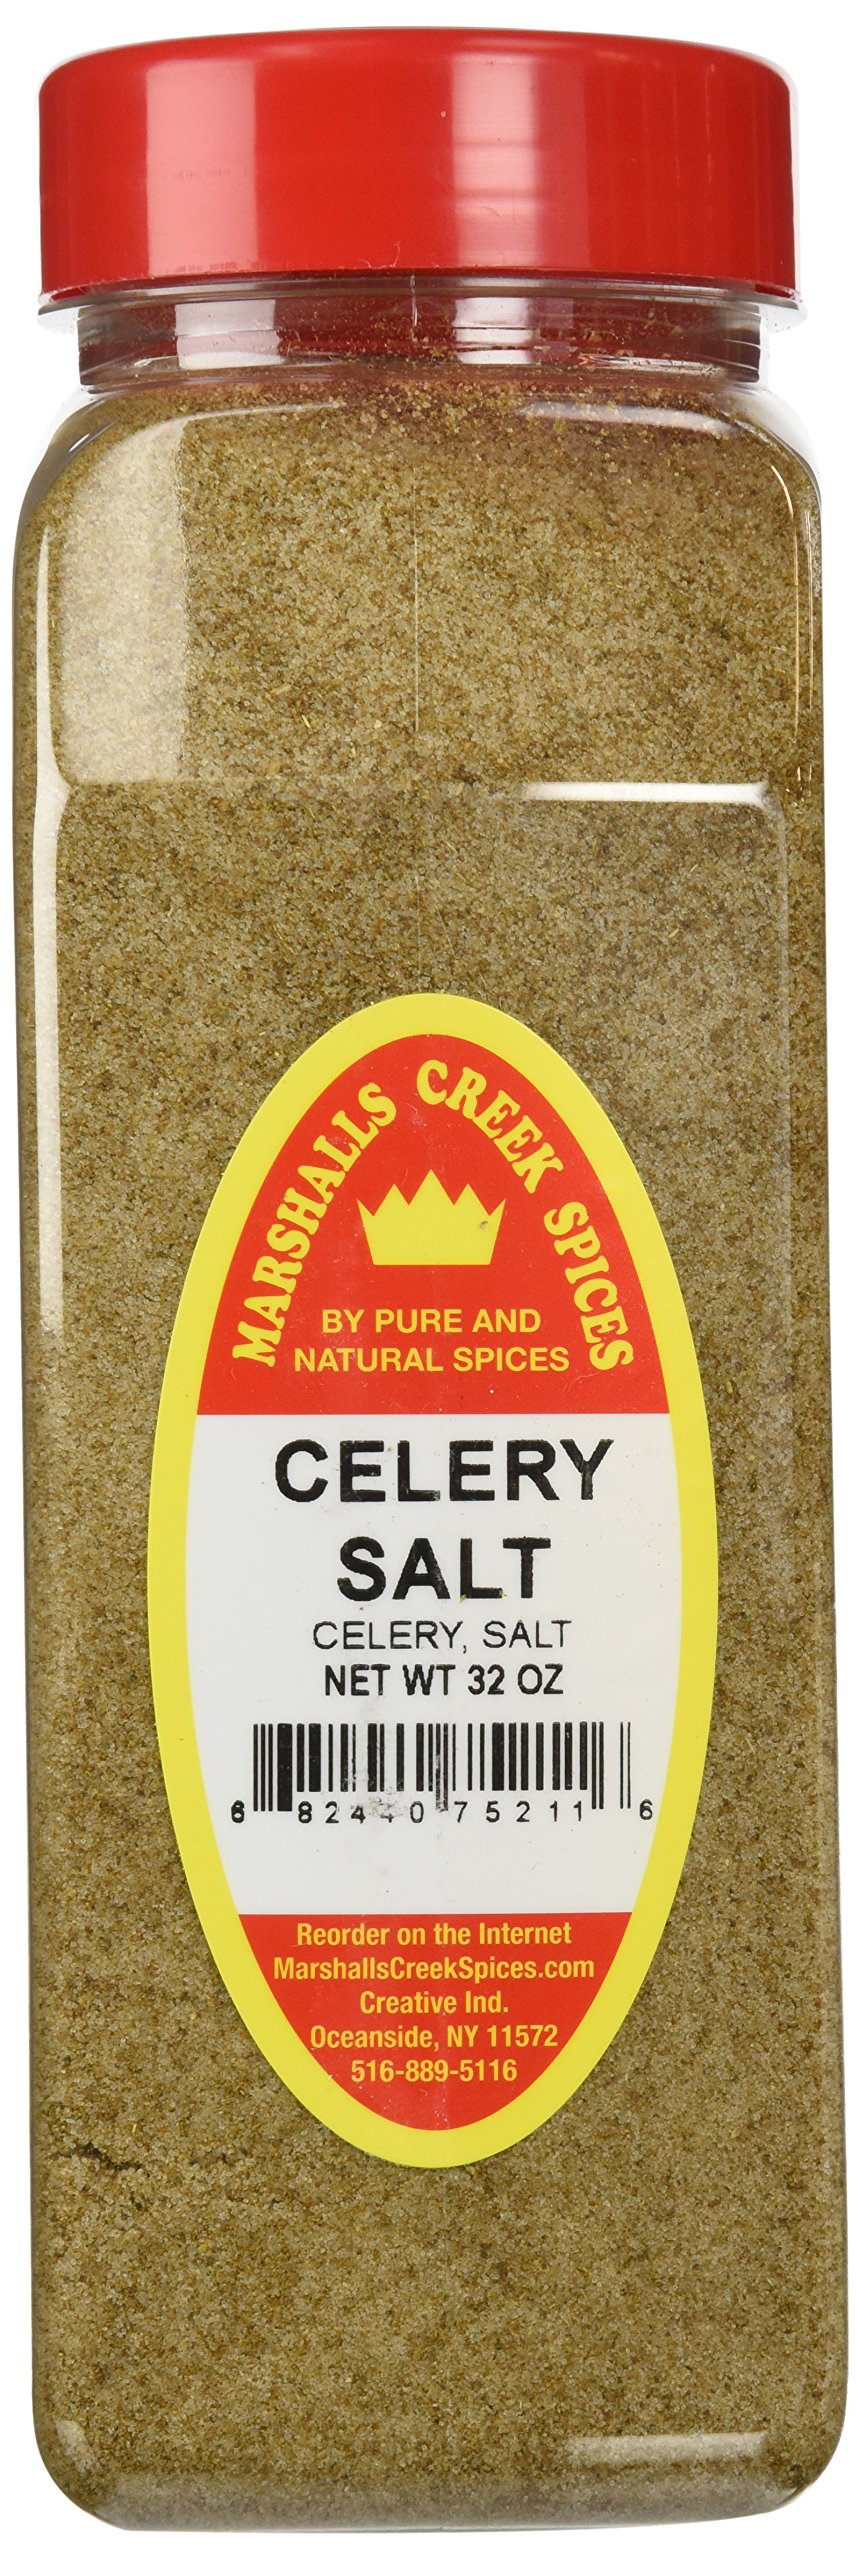 Marshalls Creek Spices X-Large Size Celery Salt, 32 Ounces